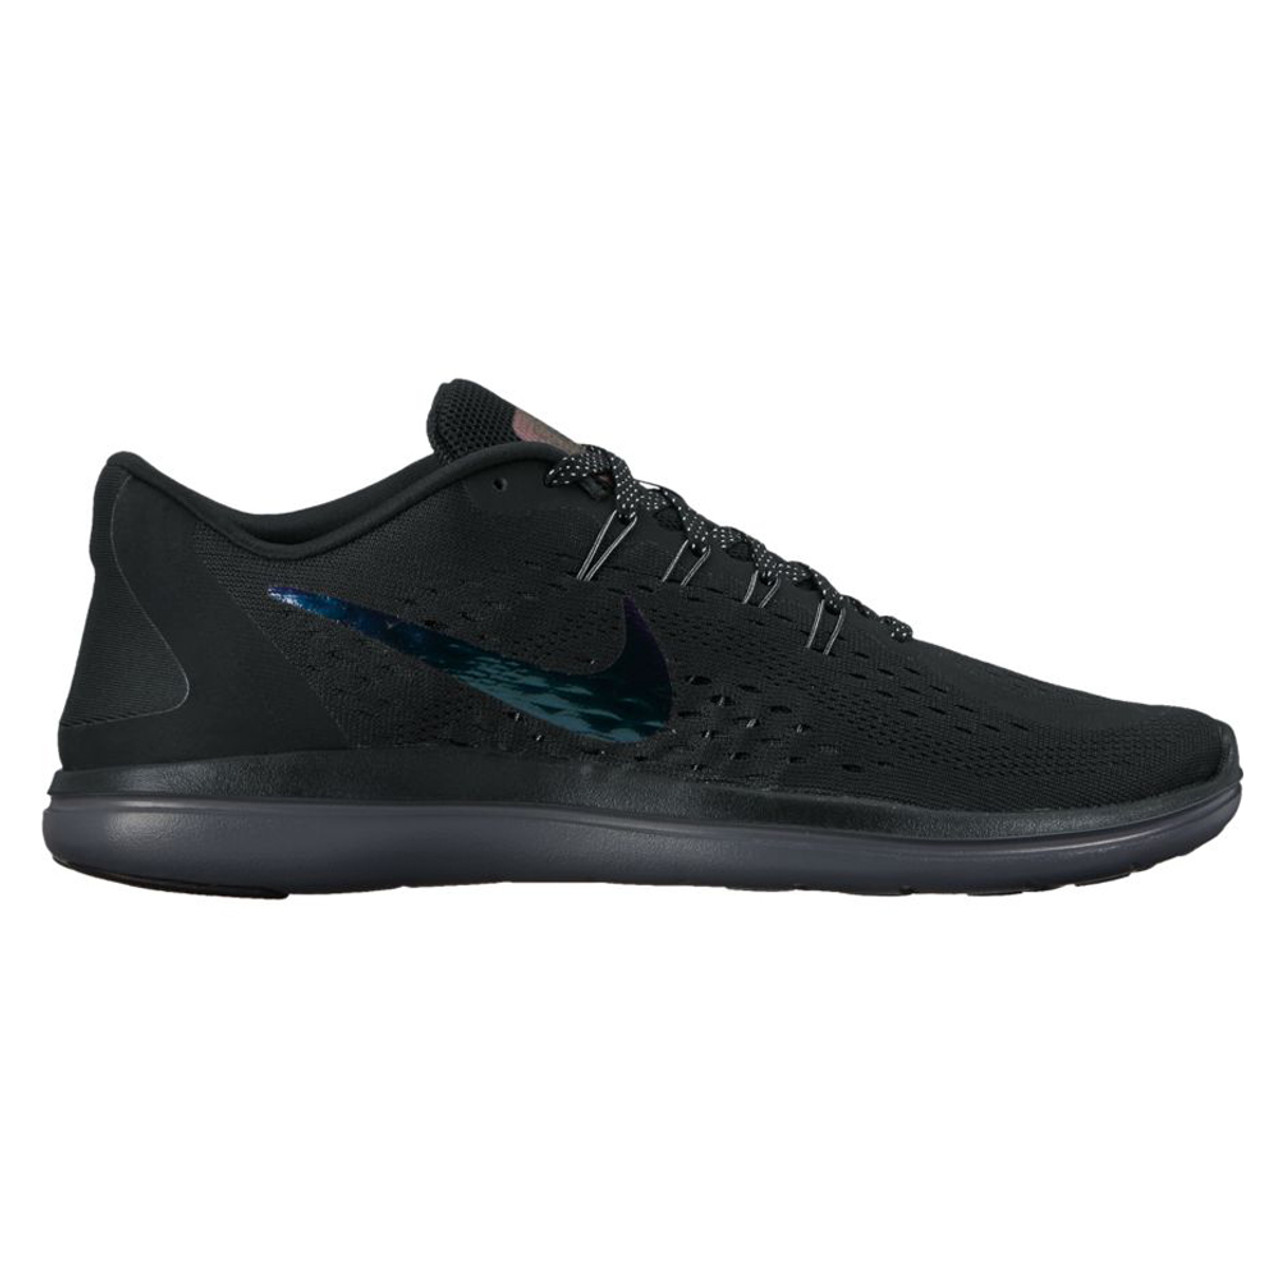 616d0e05783c Nike Women s Flex 2017 RN BTS Running Shoe Black Dark Grey - Shop now